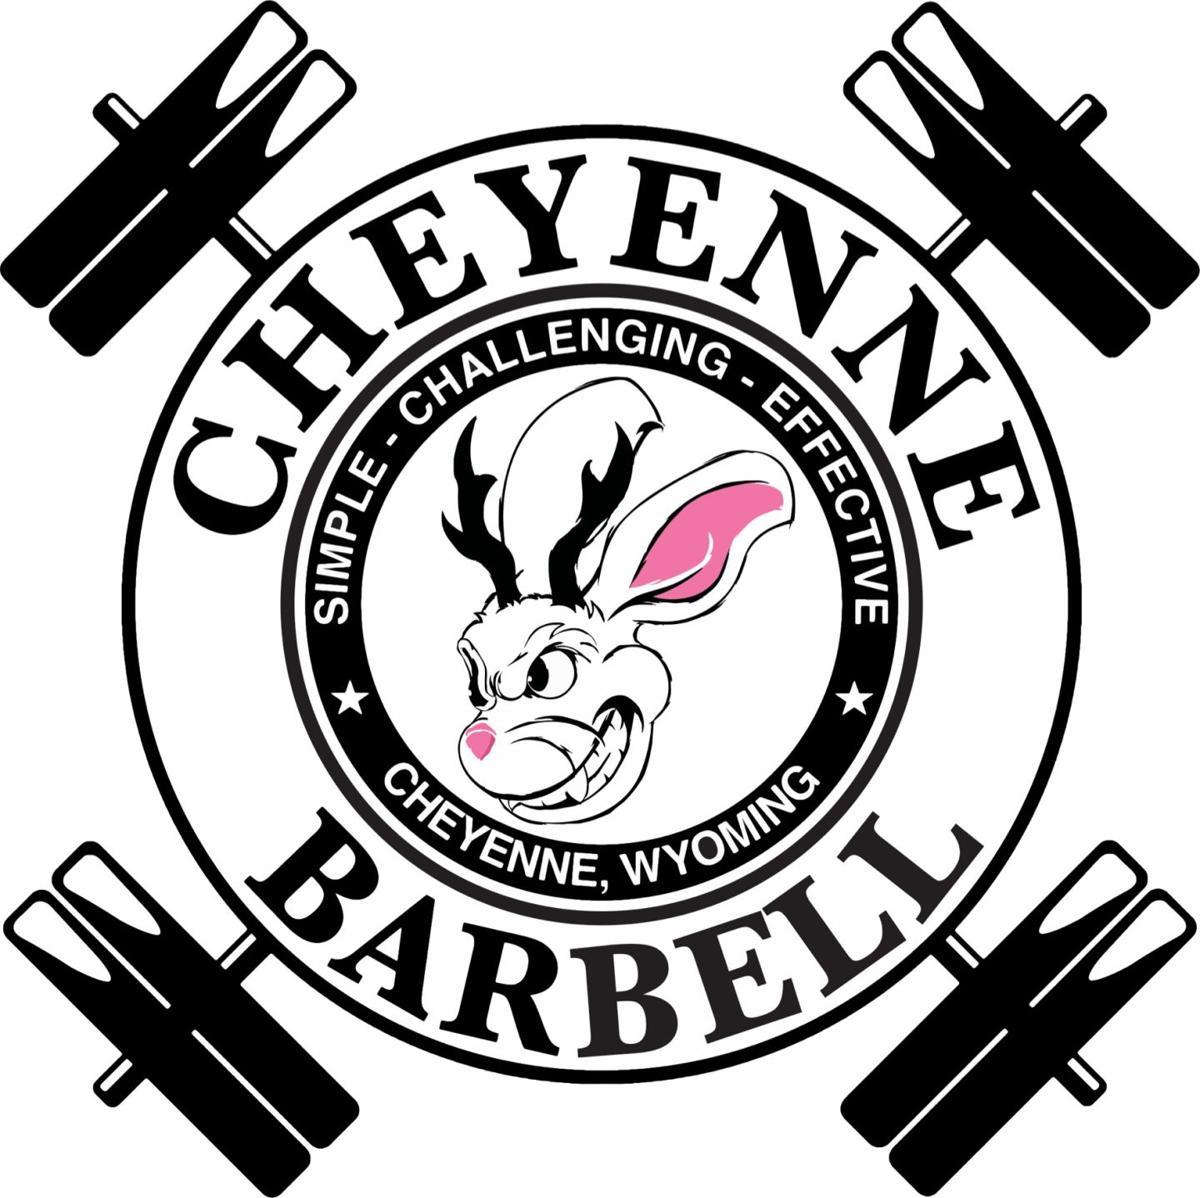 Cheyenne Barbell logo